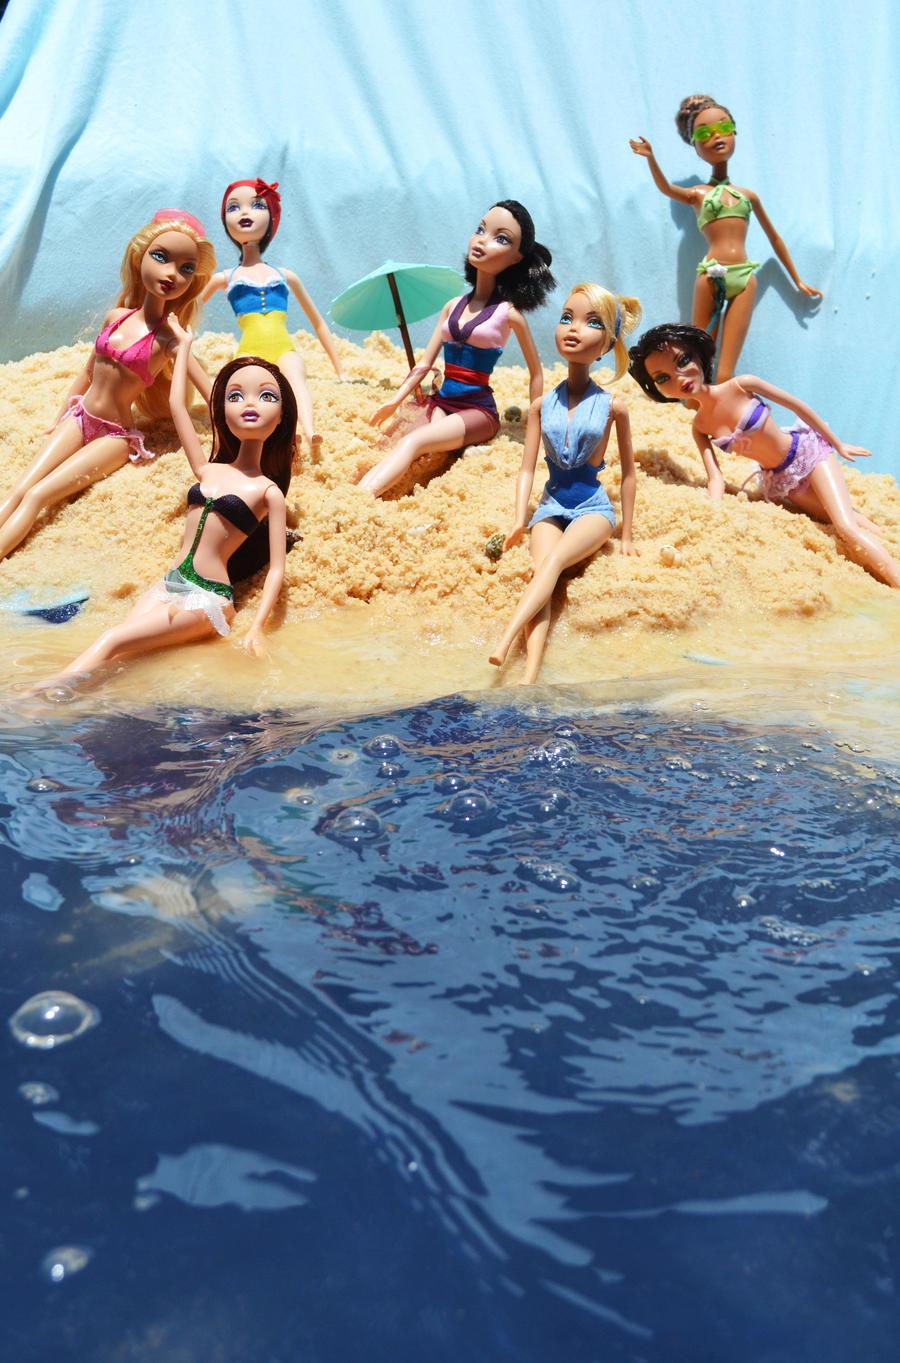 Disney Summer Fun by PinkUnicornPrincess